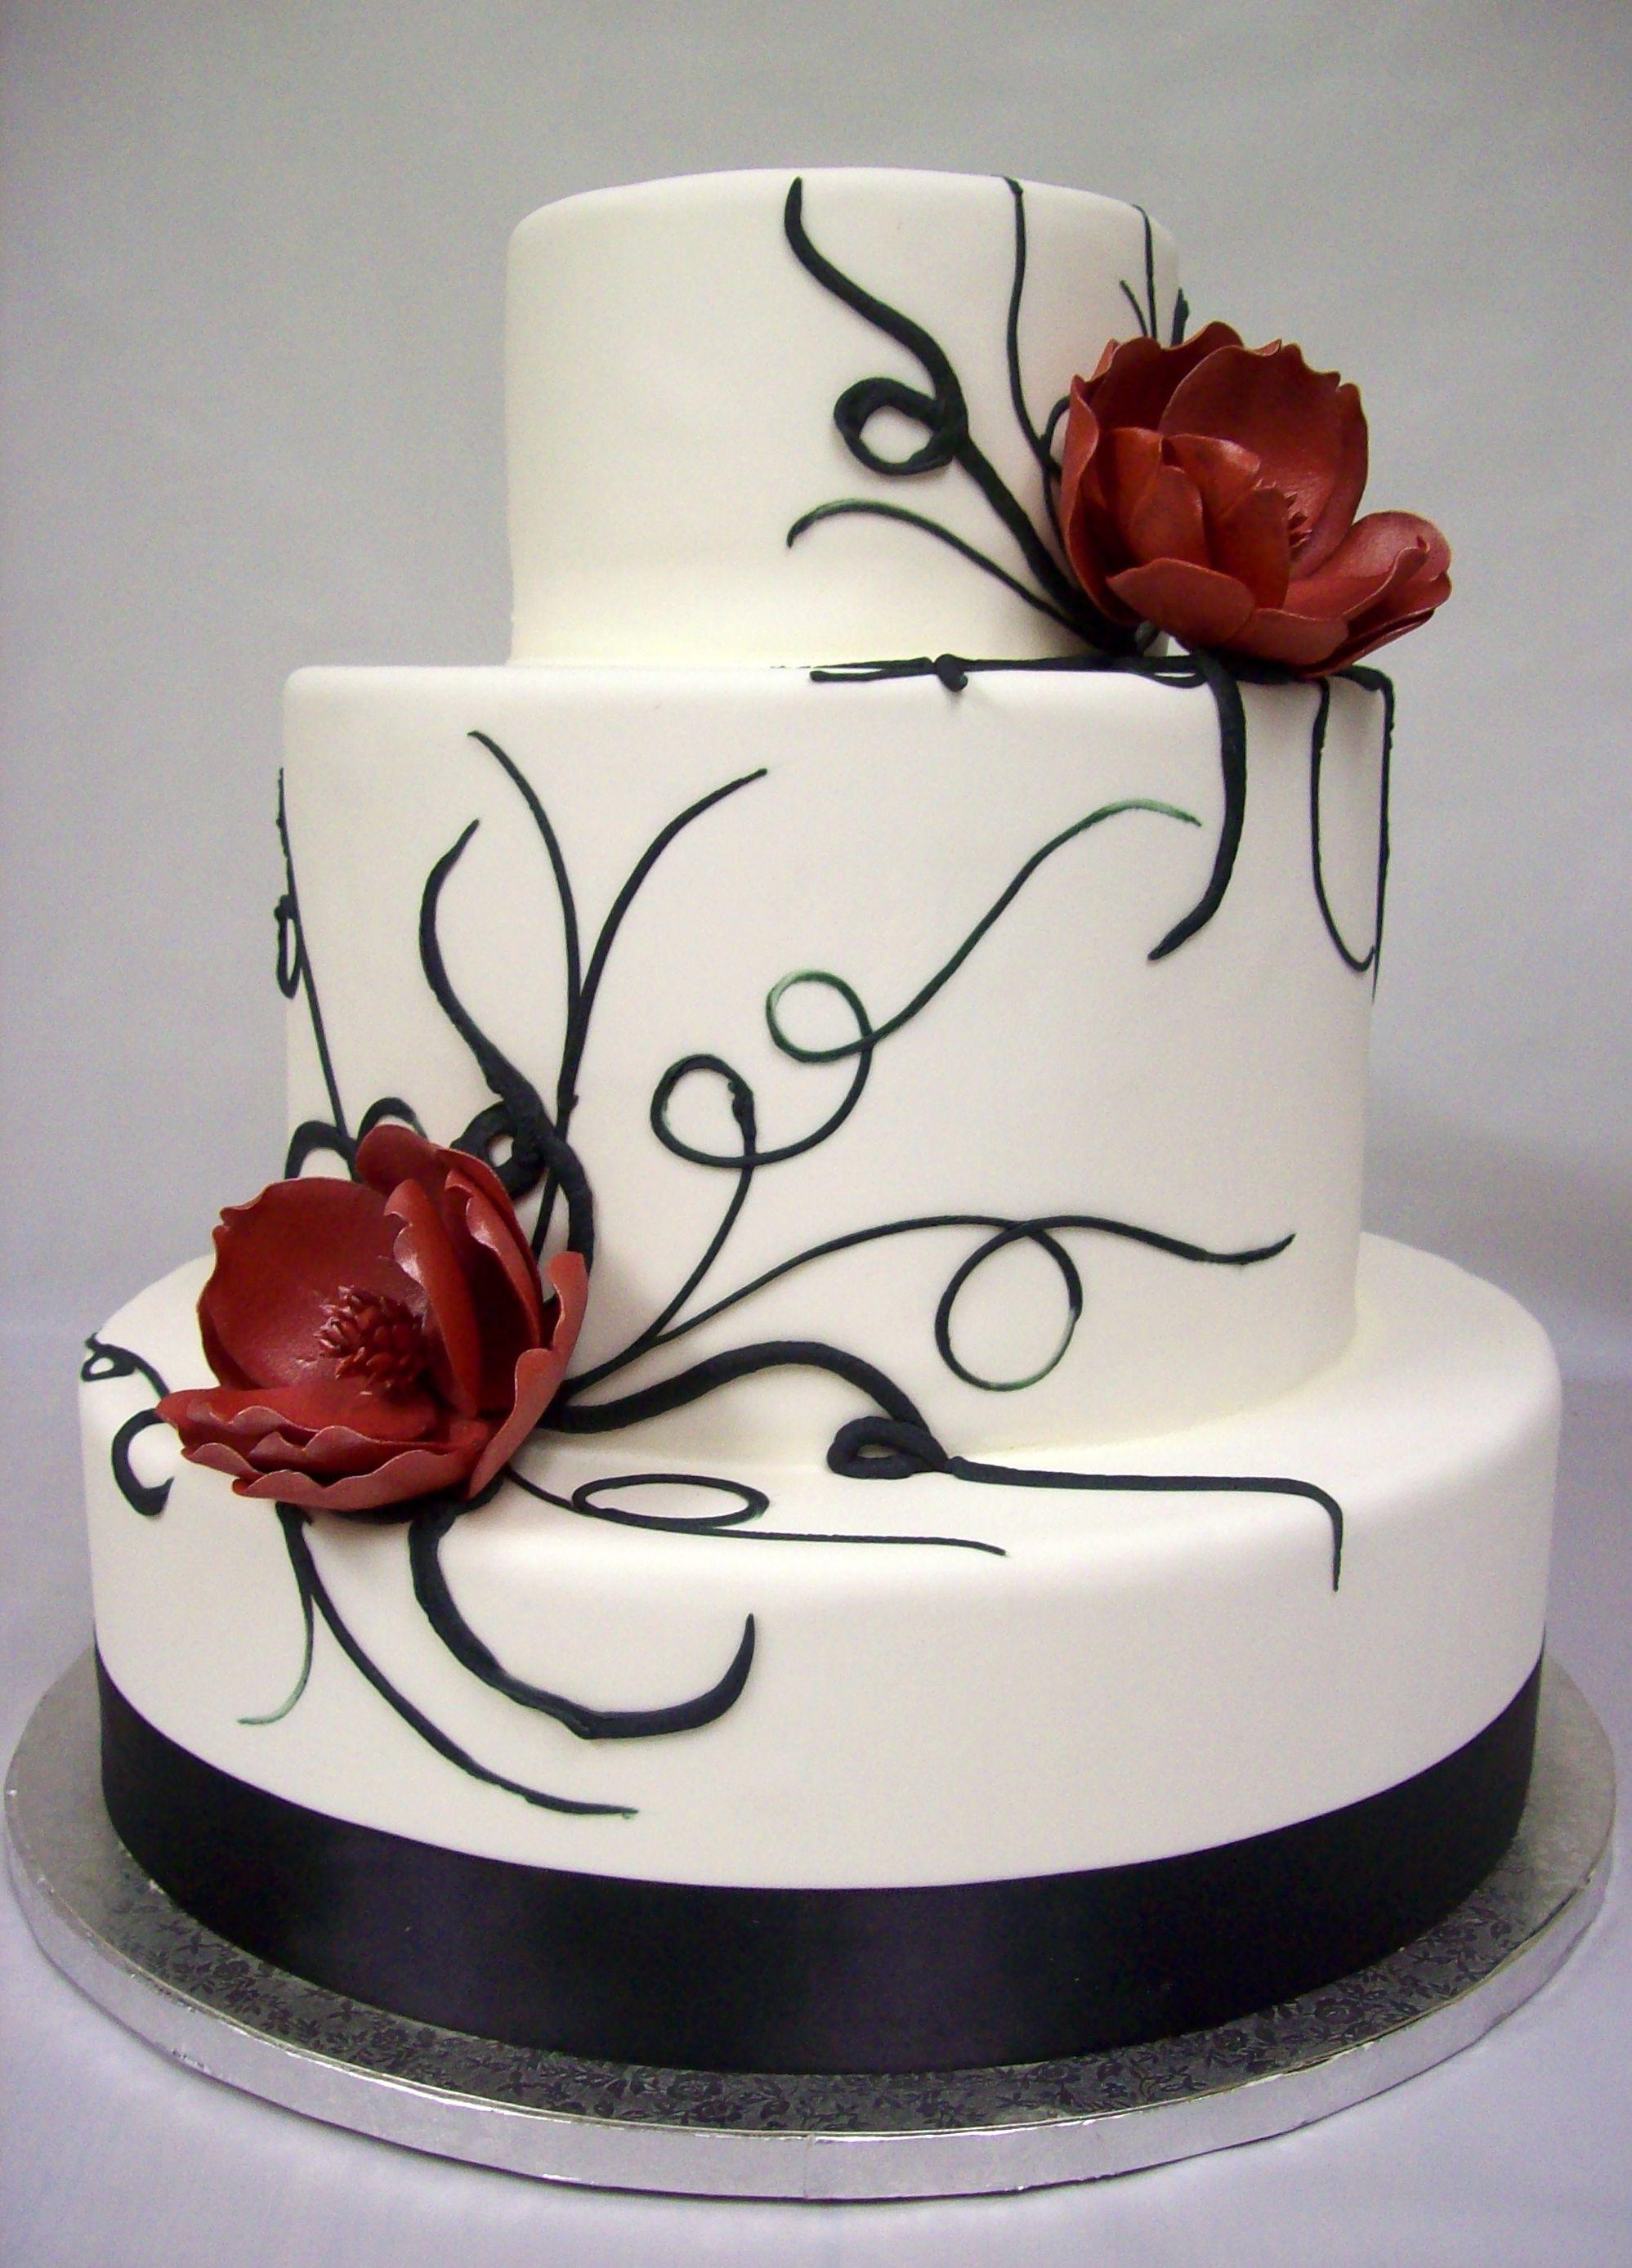 Wedding Cake Black And White  Black And White Wedding Cakes